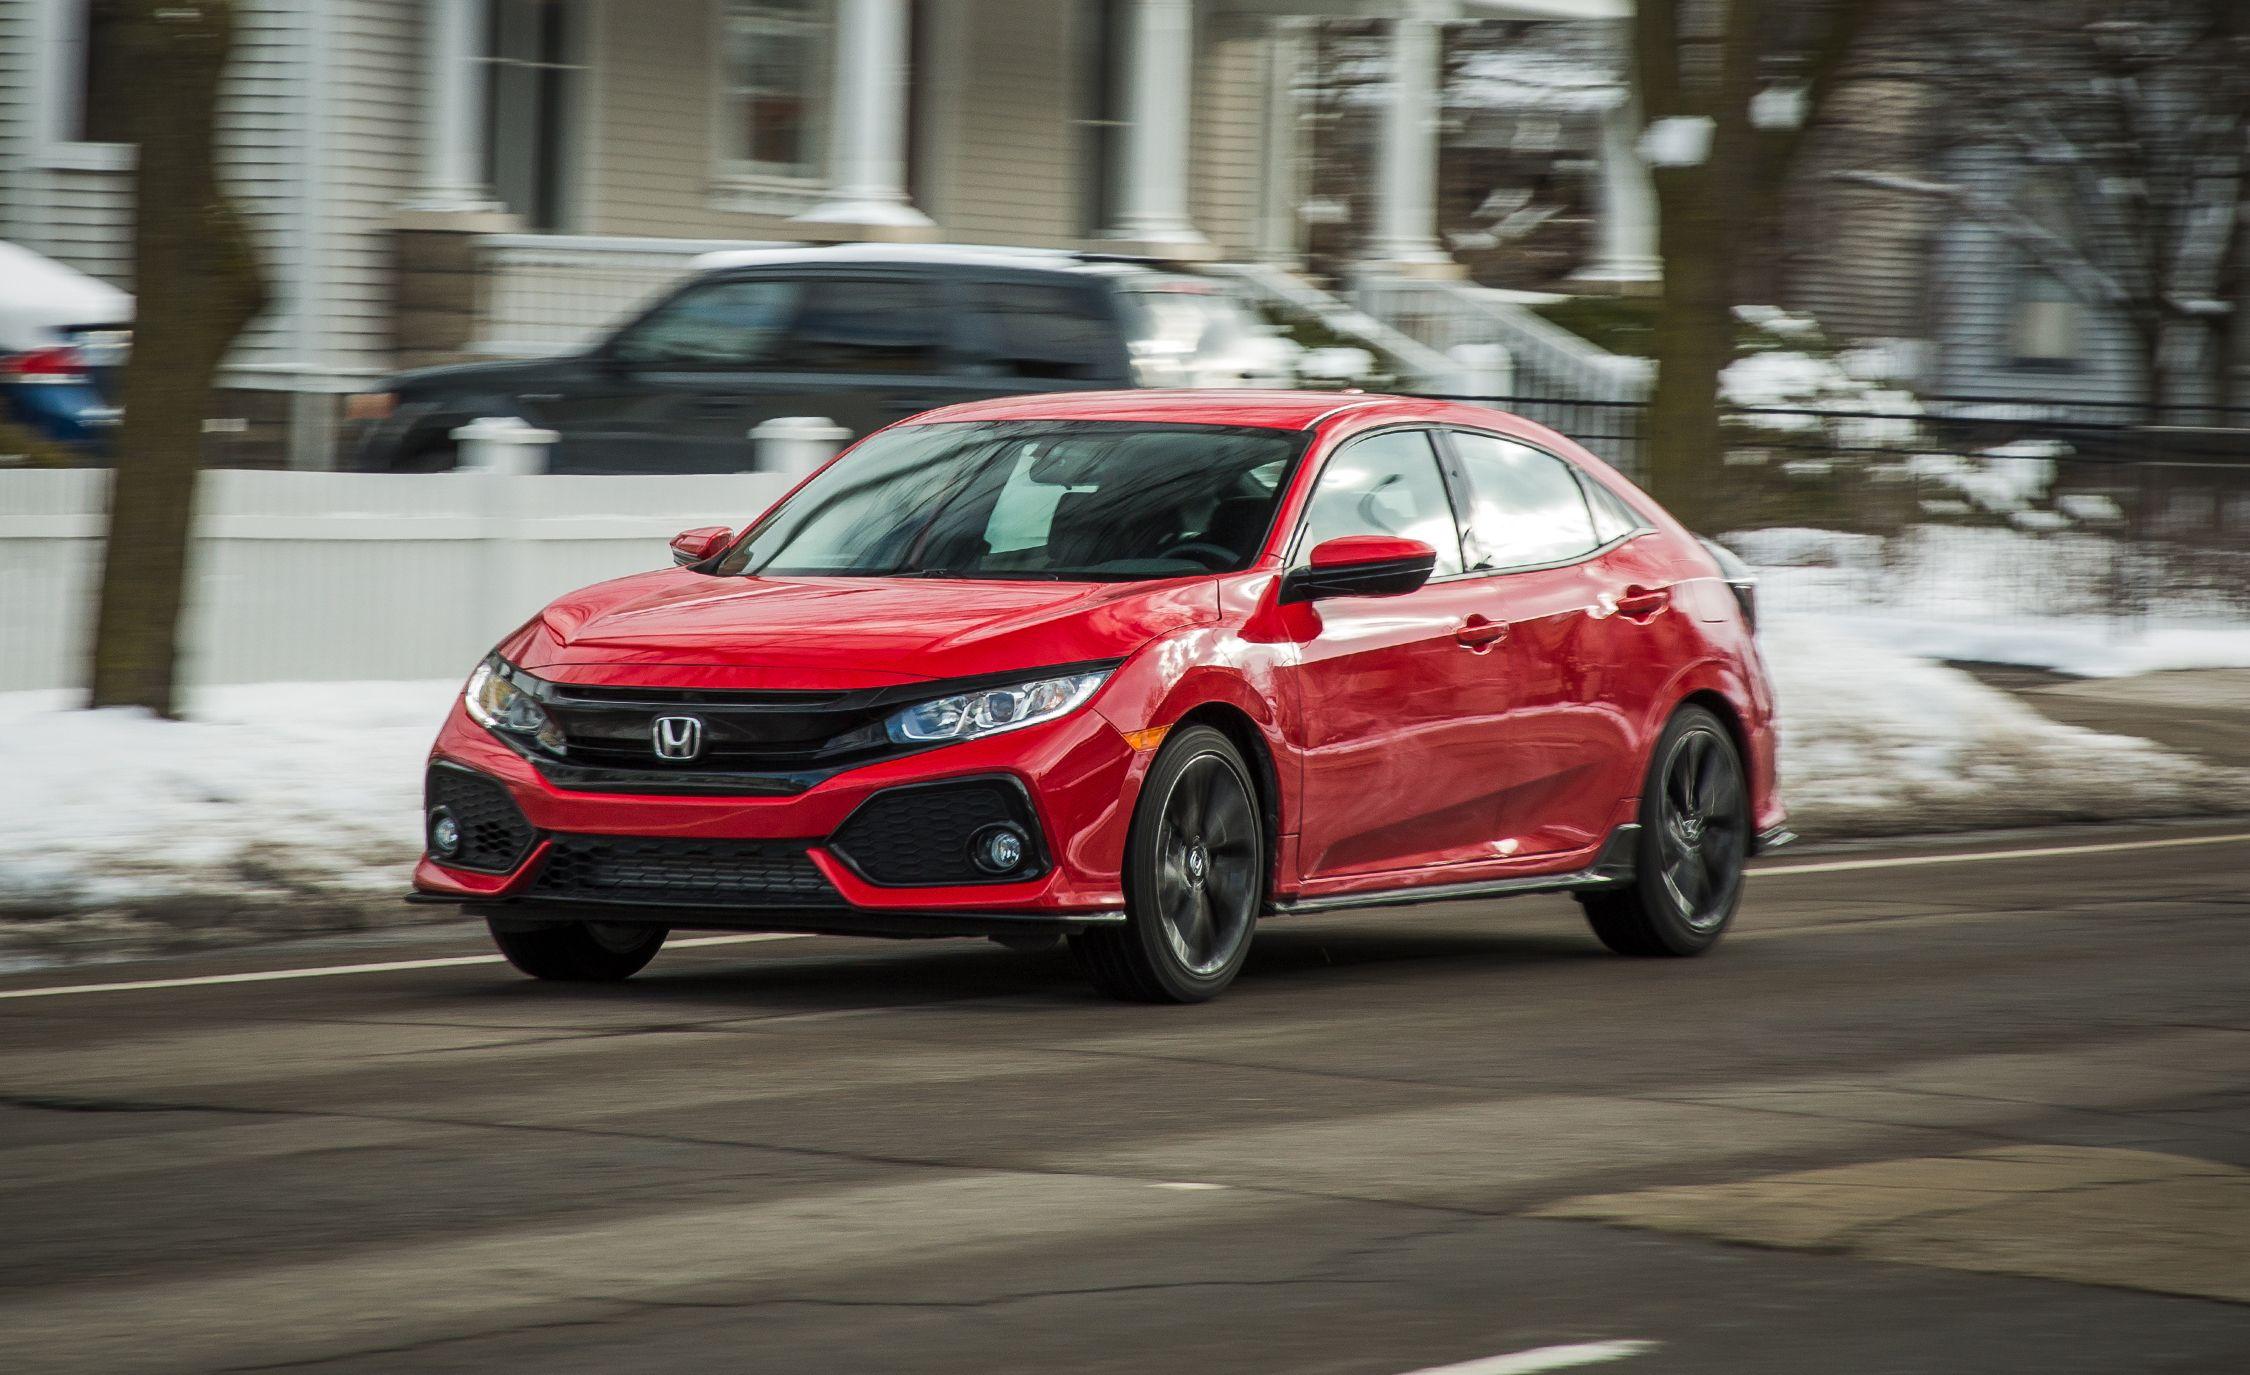 2017 honda civic hatchback 1 5t manual test review car and driver rh caranddriver com Honda Manual Transmission Fluid Honda CR-V Owners Manual